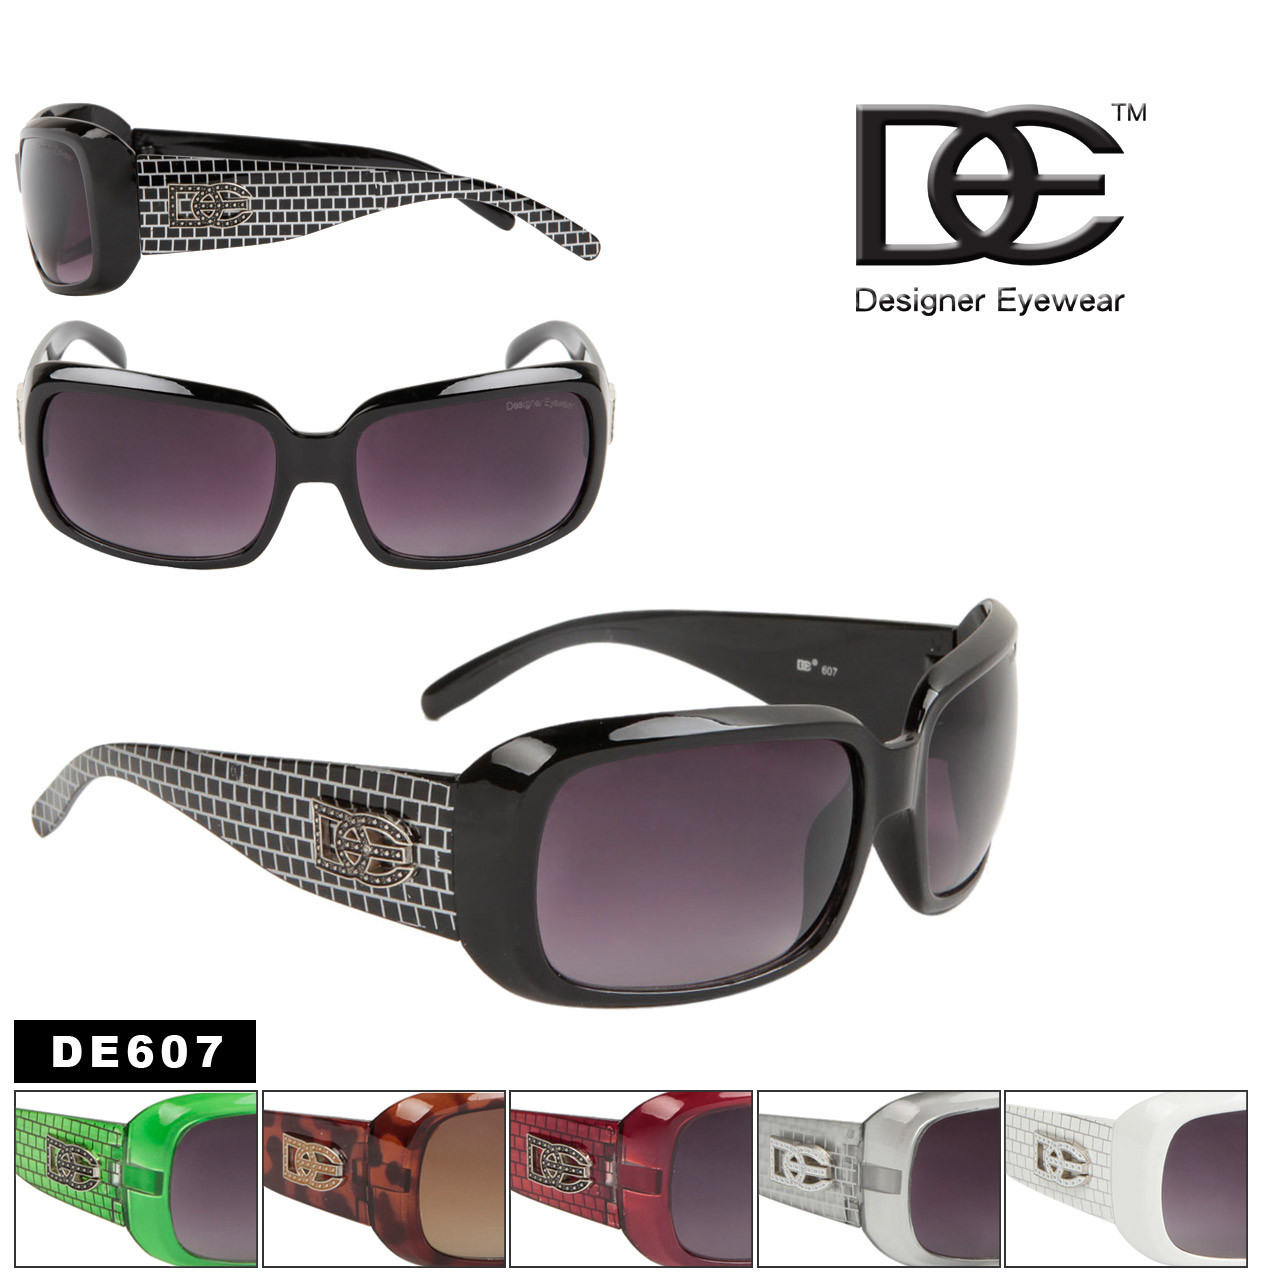 c03cf60d2a DE607 DE Designer Eyewear (1 doz.) Roxy Inspired Sunglasses